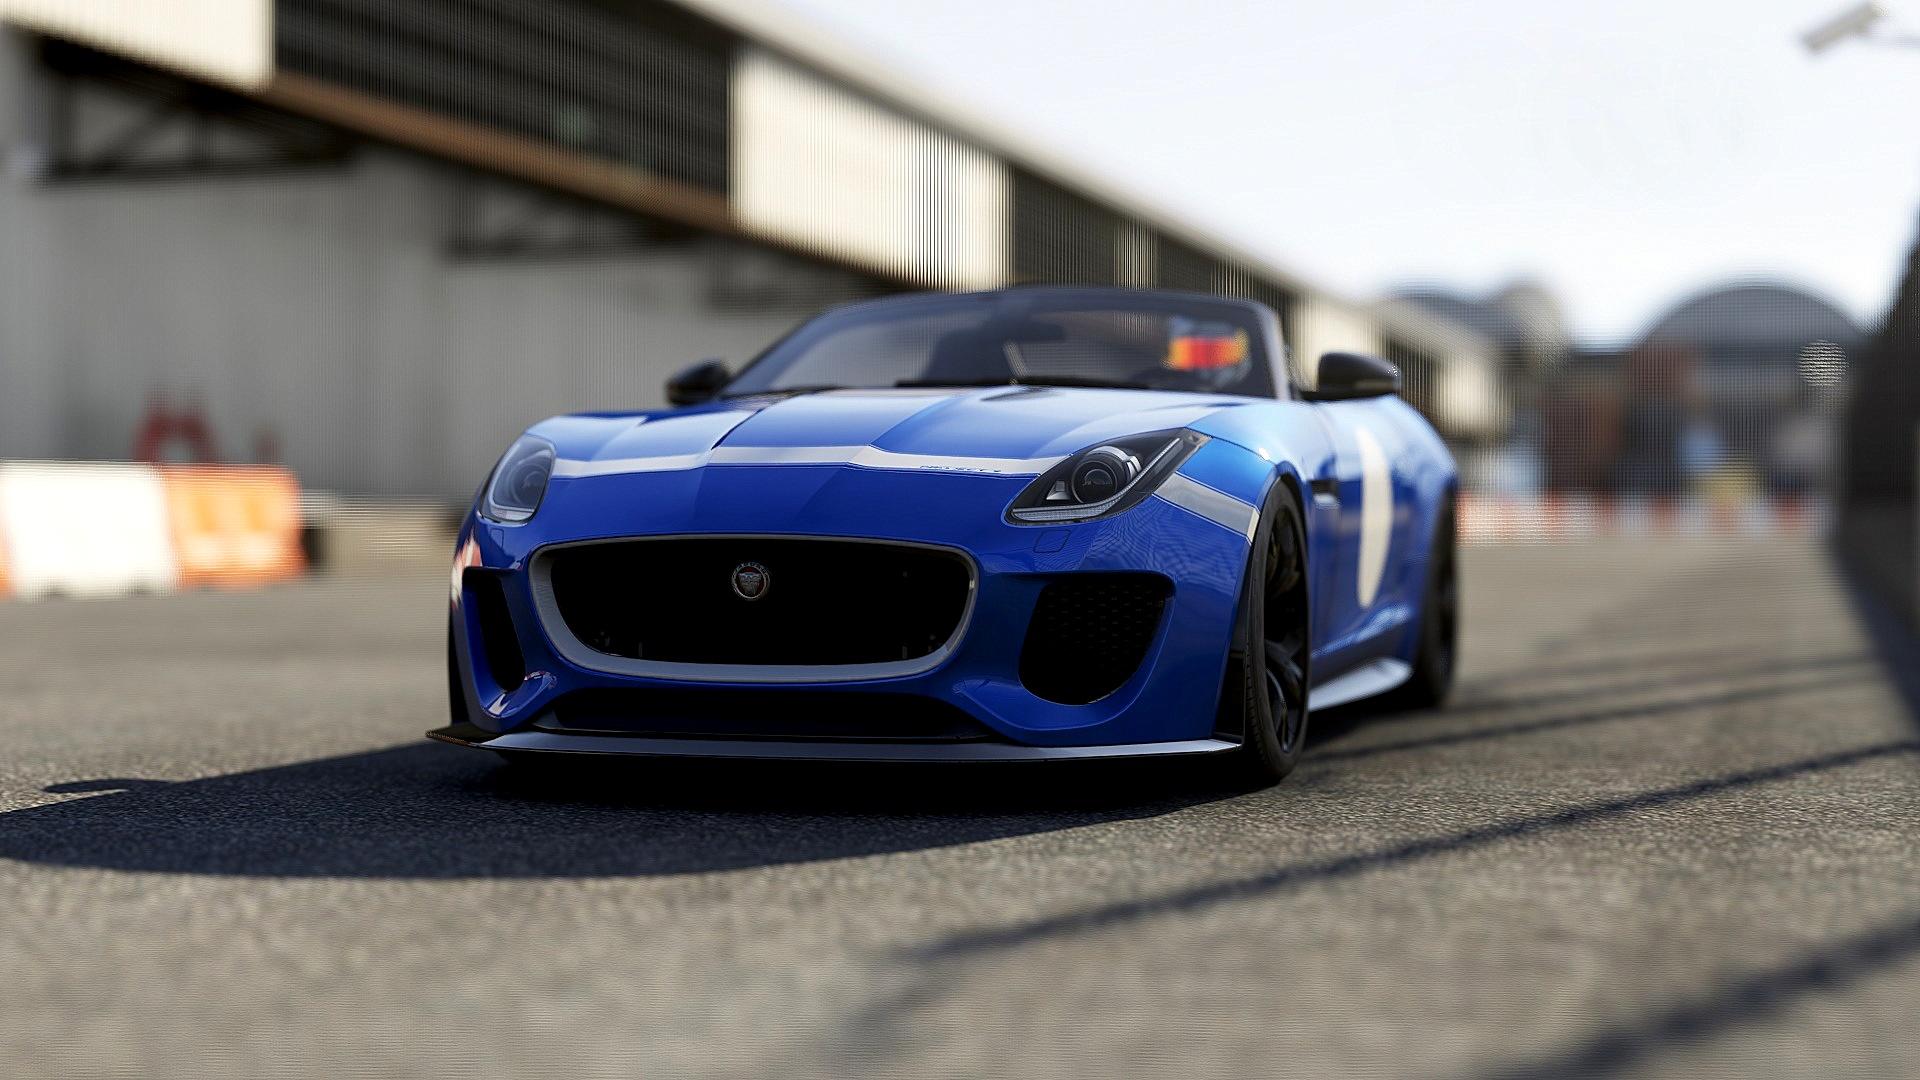 Car Vehicle Sports Car Supercar Land Vehicle Automobile Make Automotive Design Luxury Vehicle Performance Car Maserati Public Domain